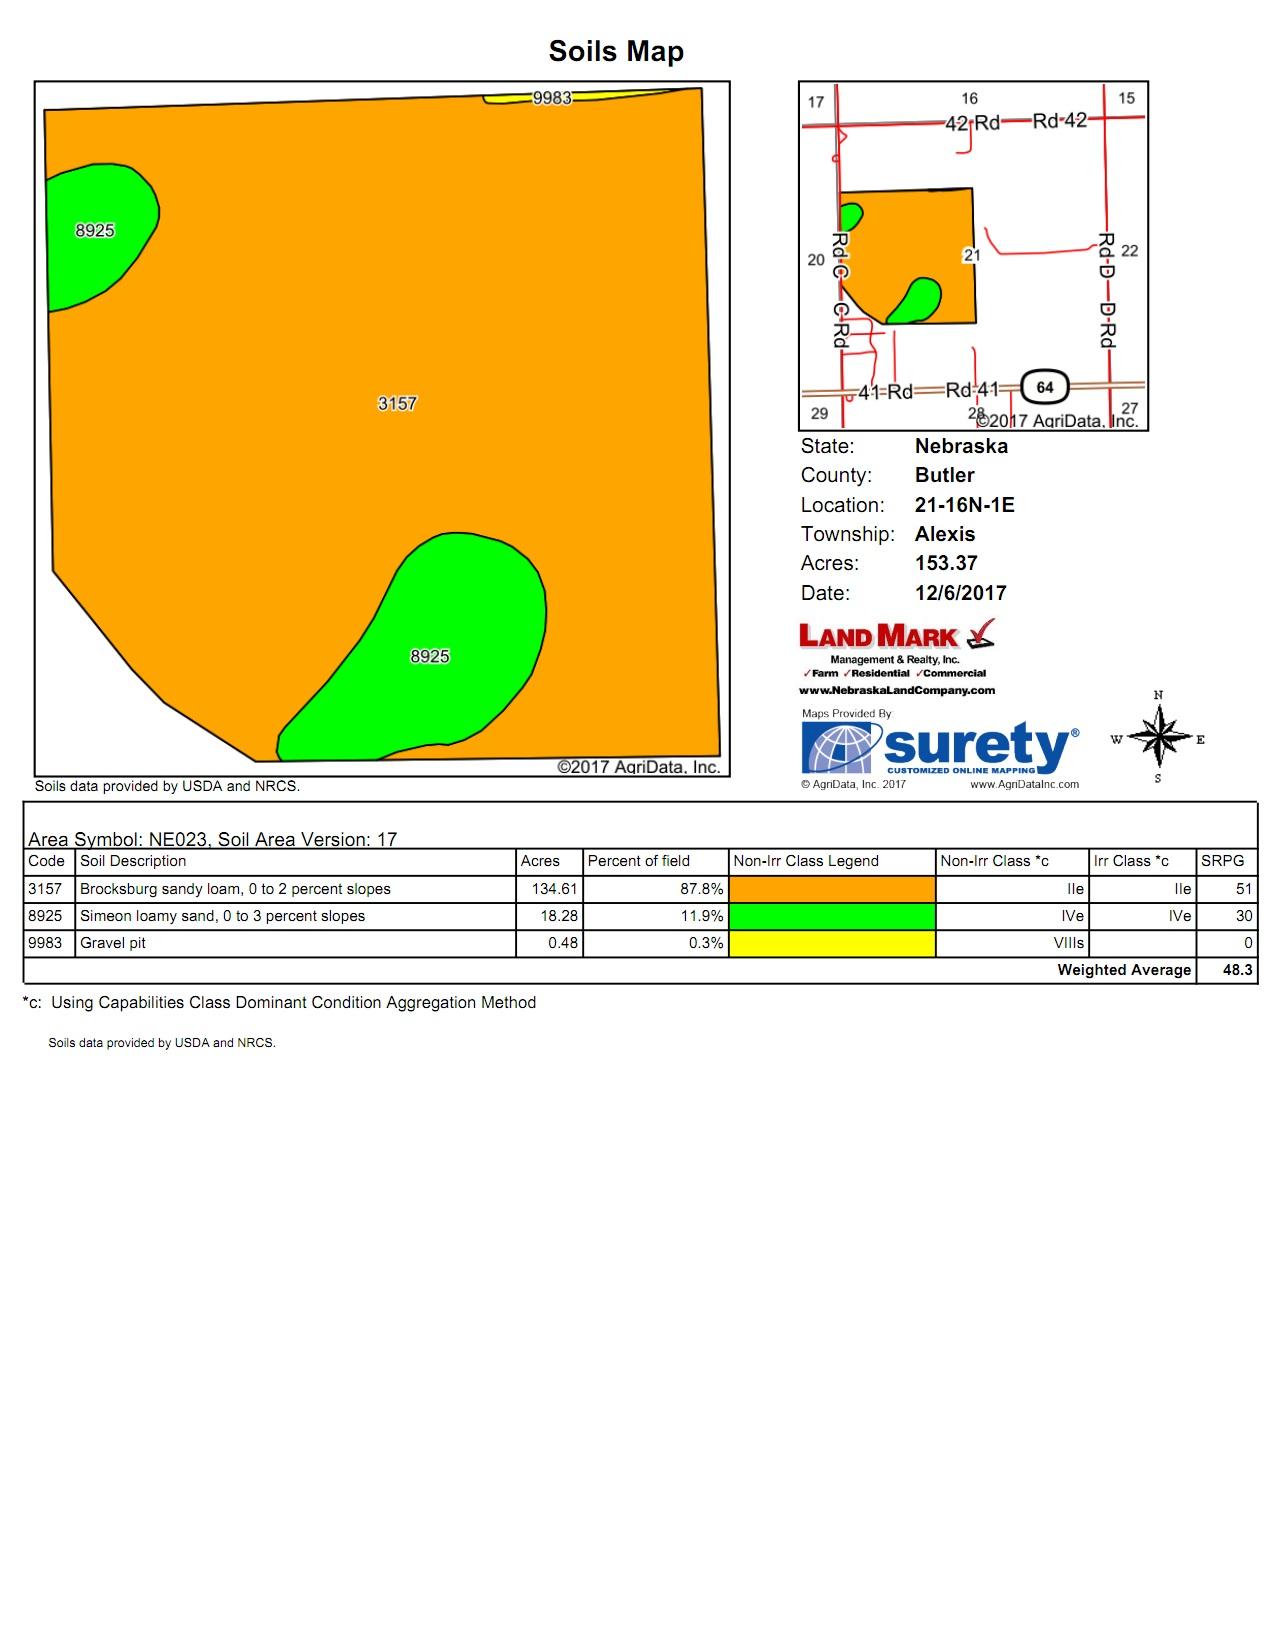 Tract 3 Soil Map.jpg